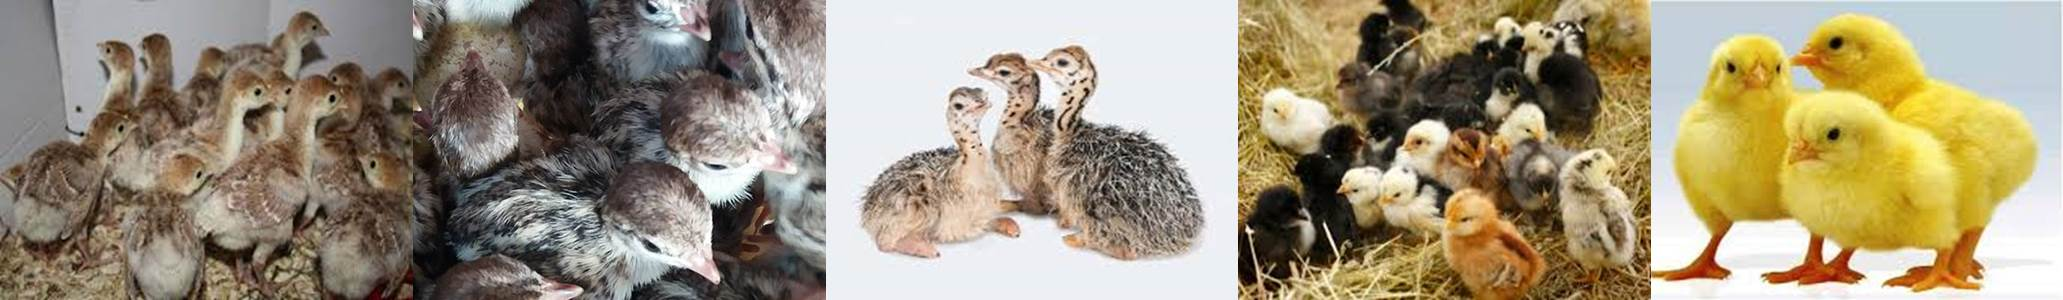 نمونه تک ، فروش طيور و پرورش جوجه بومي بوقلمون شترمرغ بوقلمون اردك09124439674 09124496359 09131392838 09131393868 09128381978